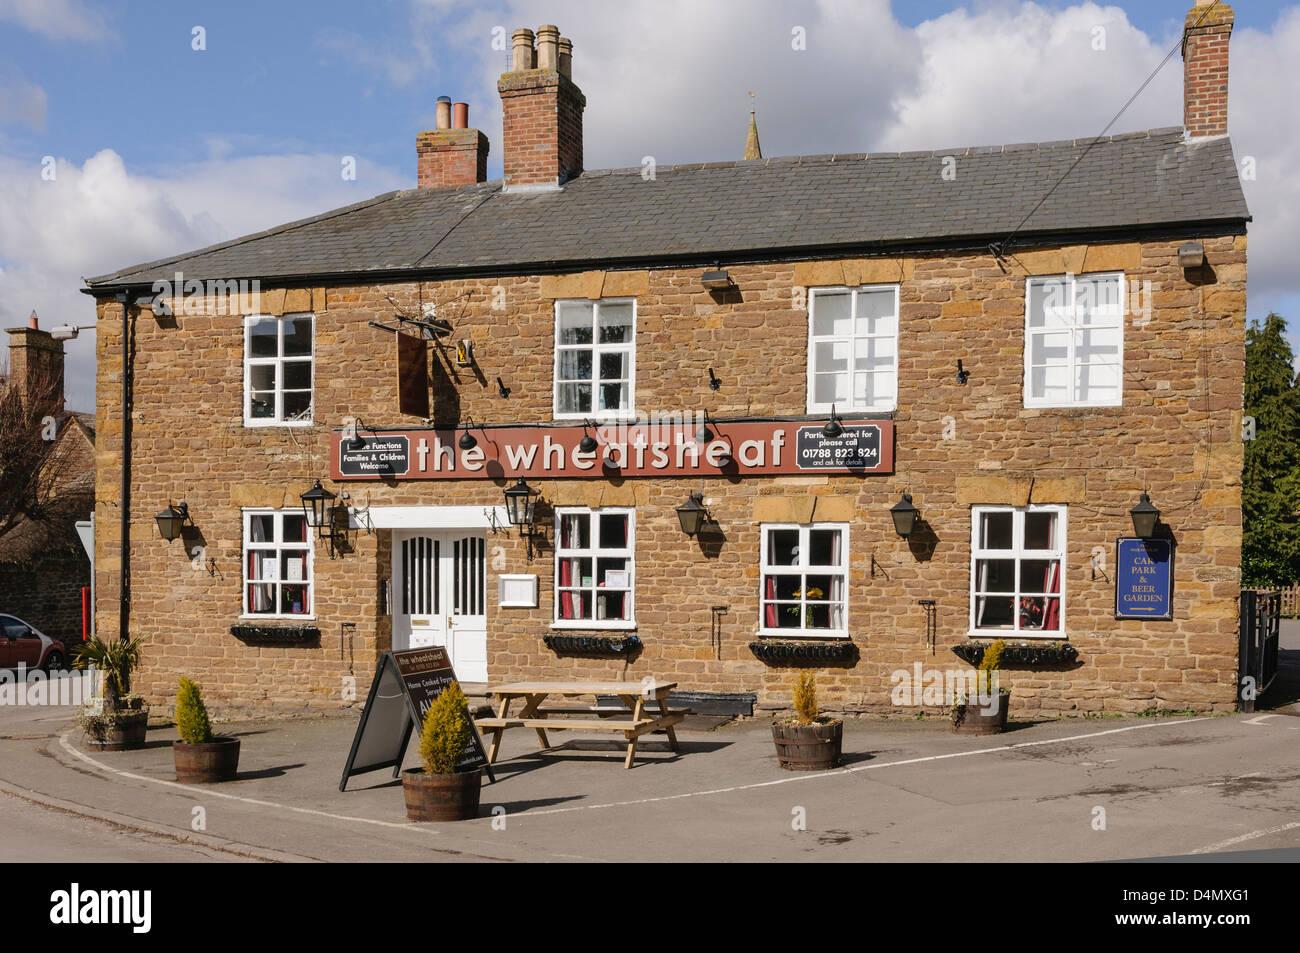 The Wheatsheaf pub in Crick, Northampton - Stock Image